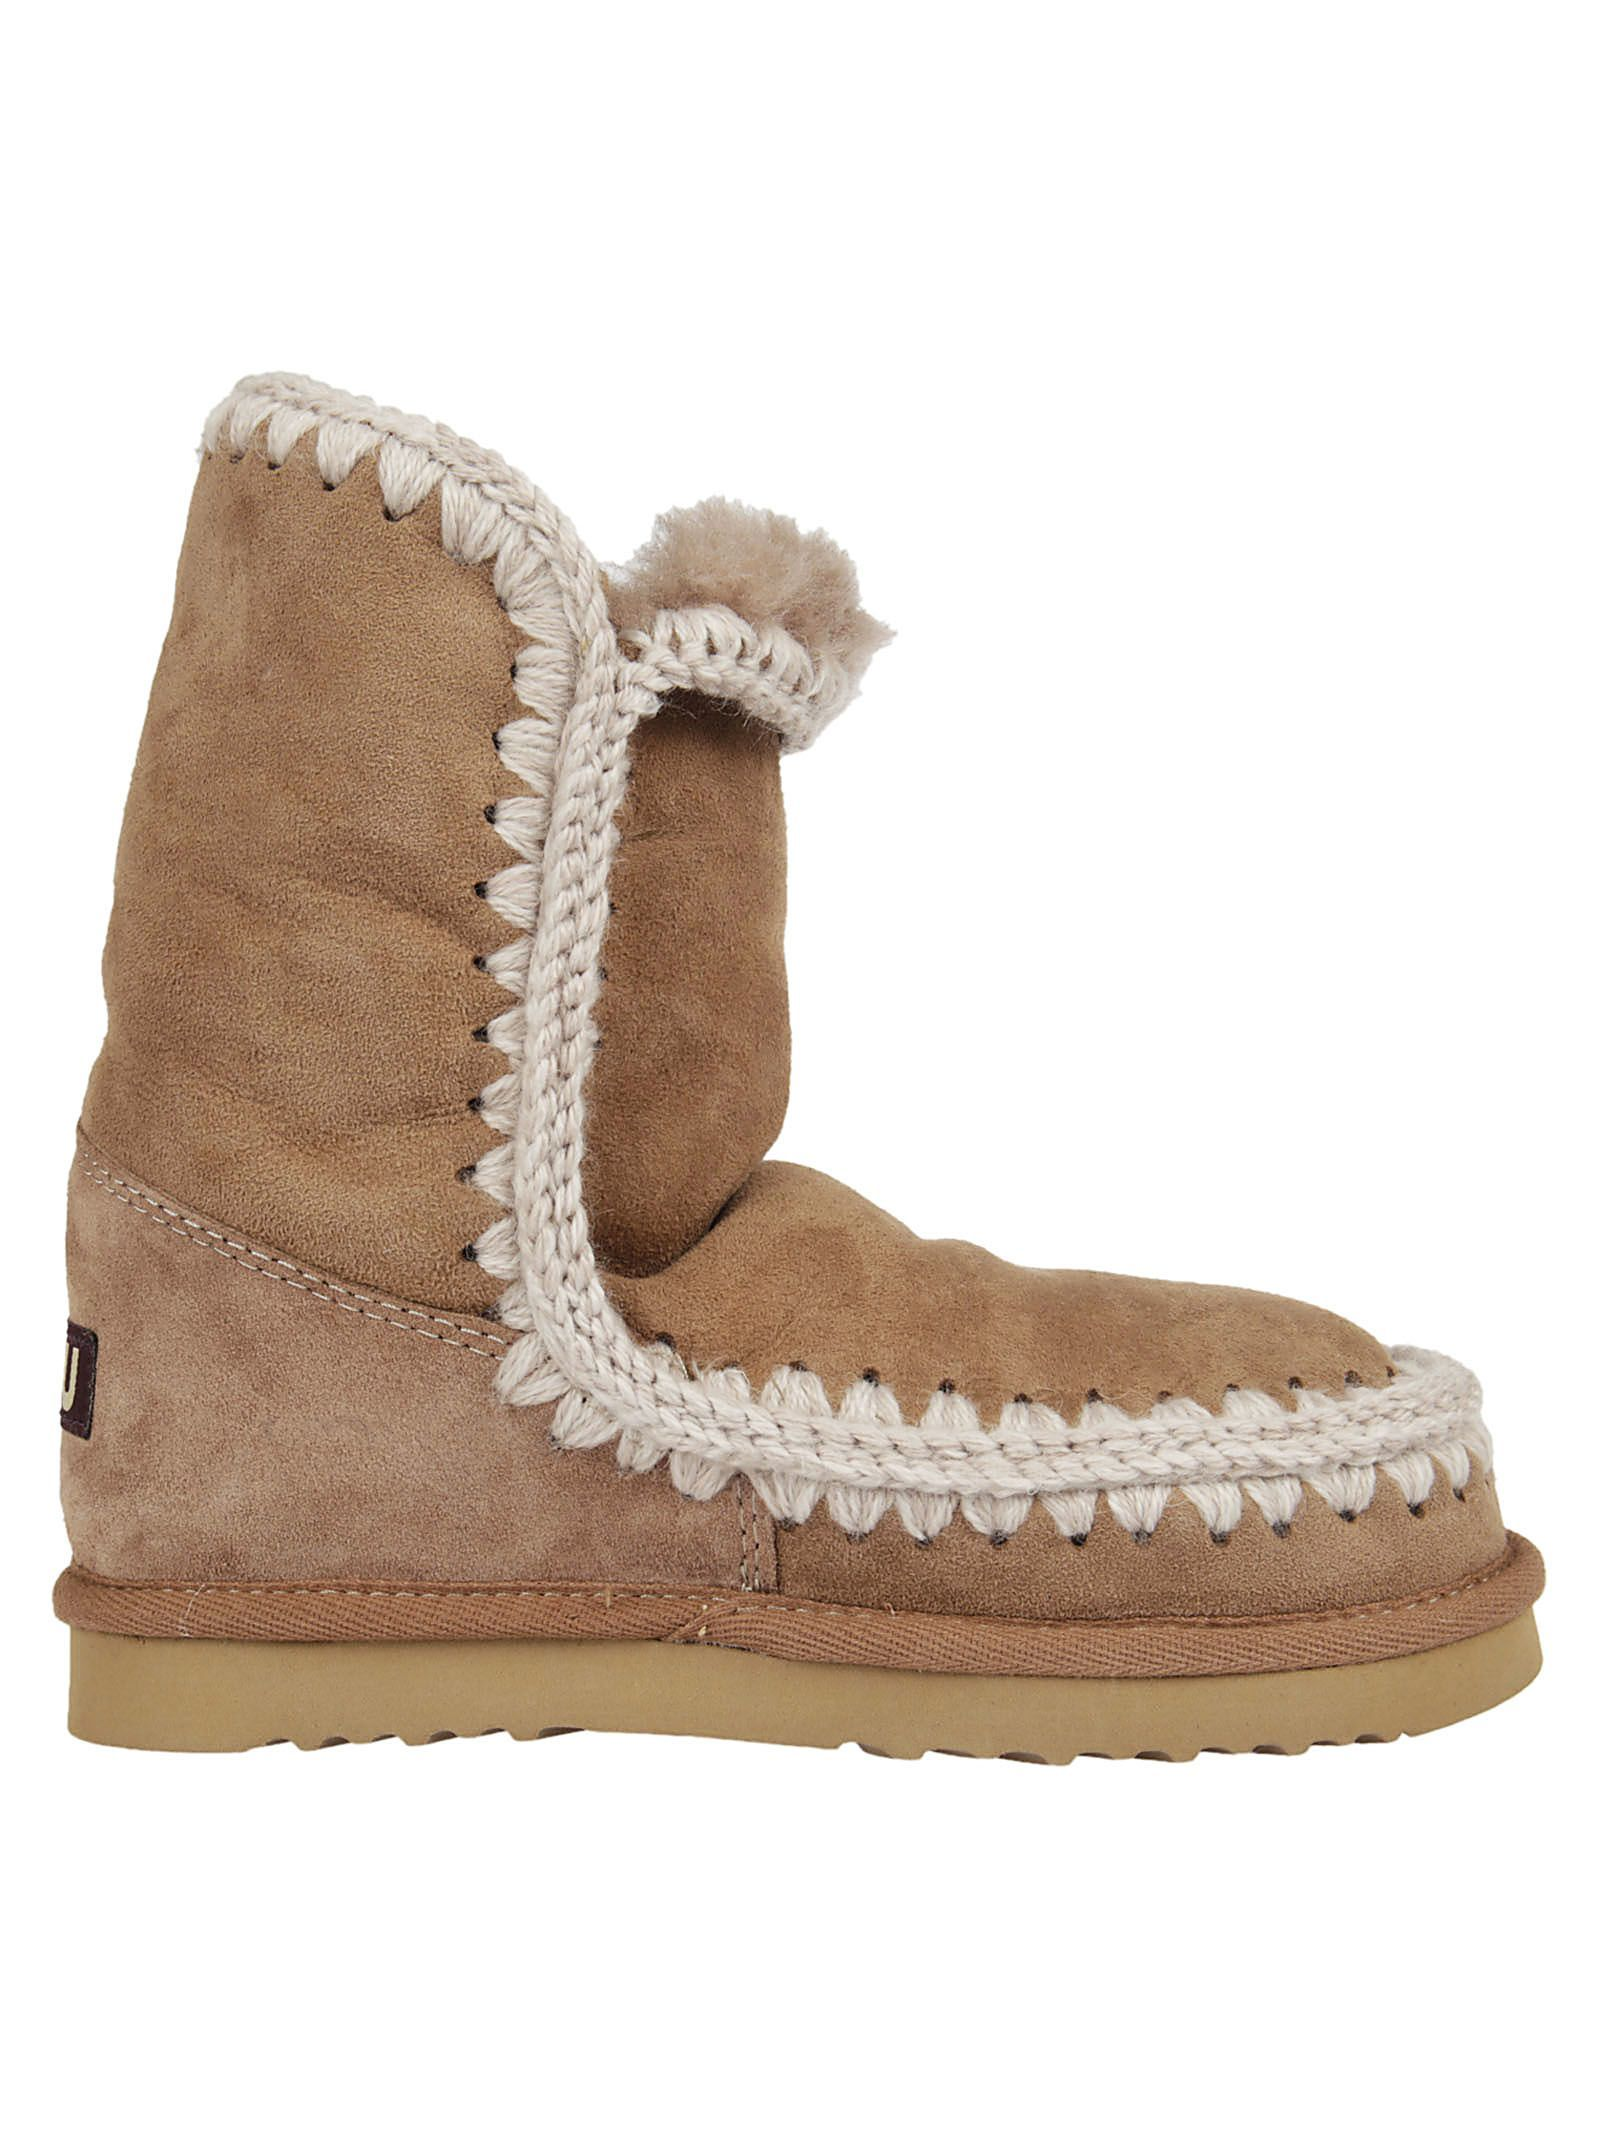 Mou mou Boots Fashion 24 boots Eskimo shoes v1rOqvw